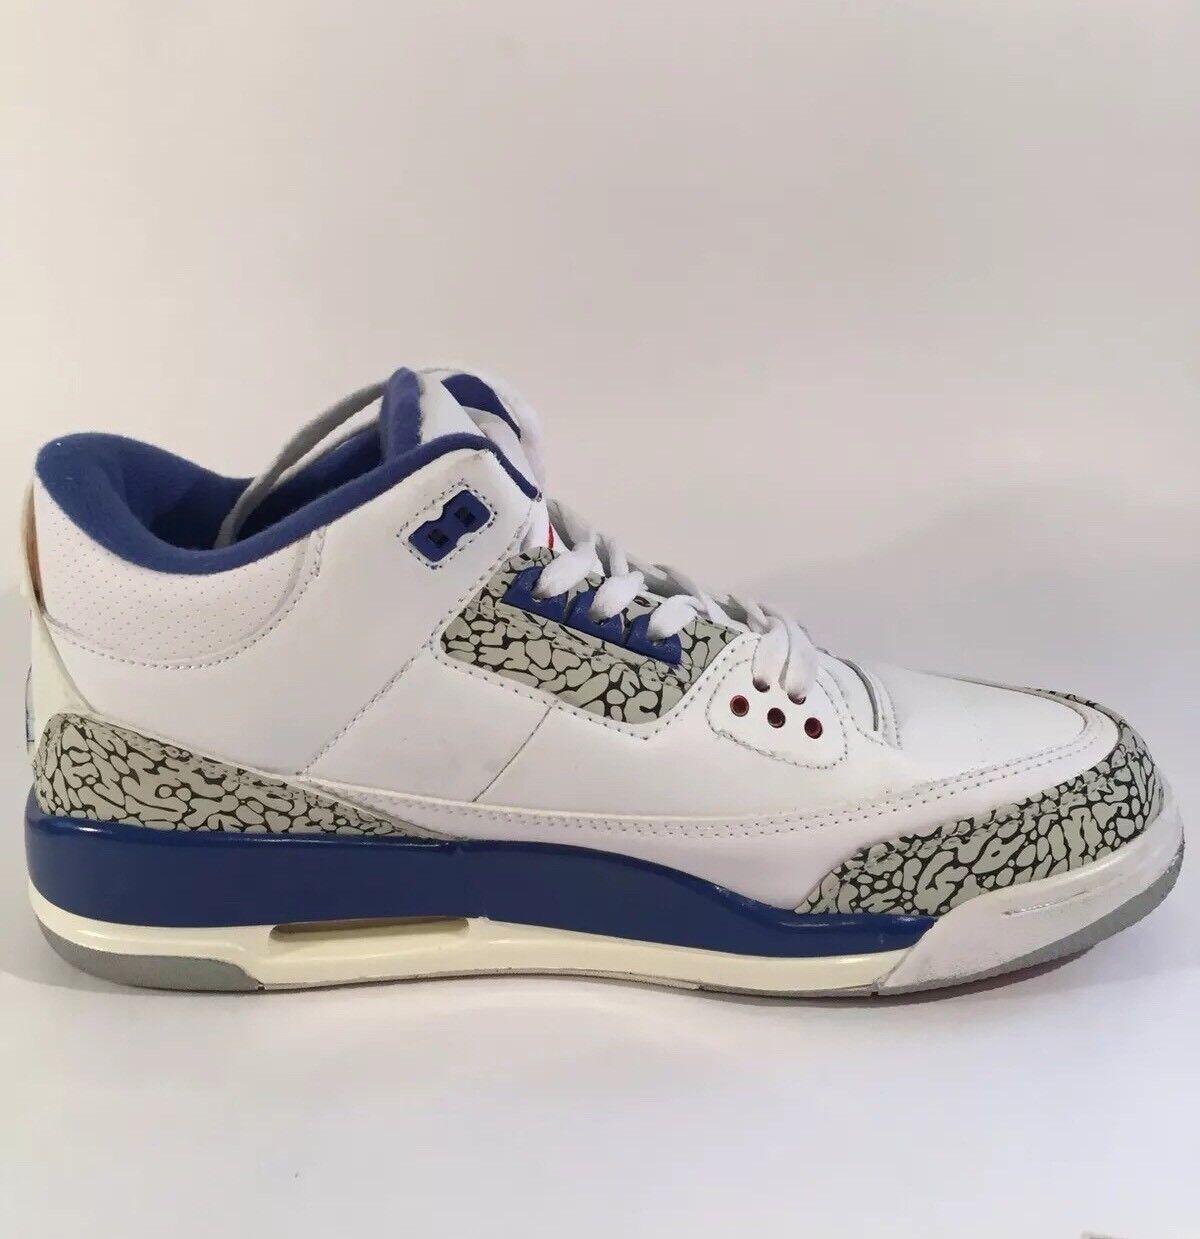 Nike Air Jordan Retro III 3 OG True Blue Men's Size 12 Athletic Shoes